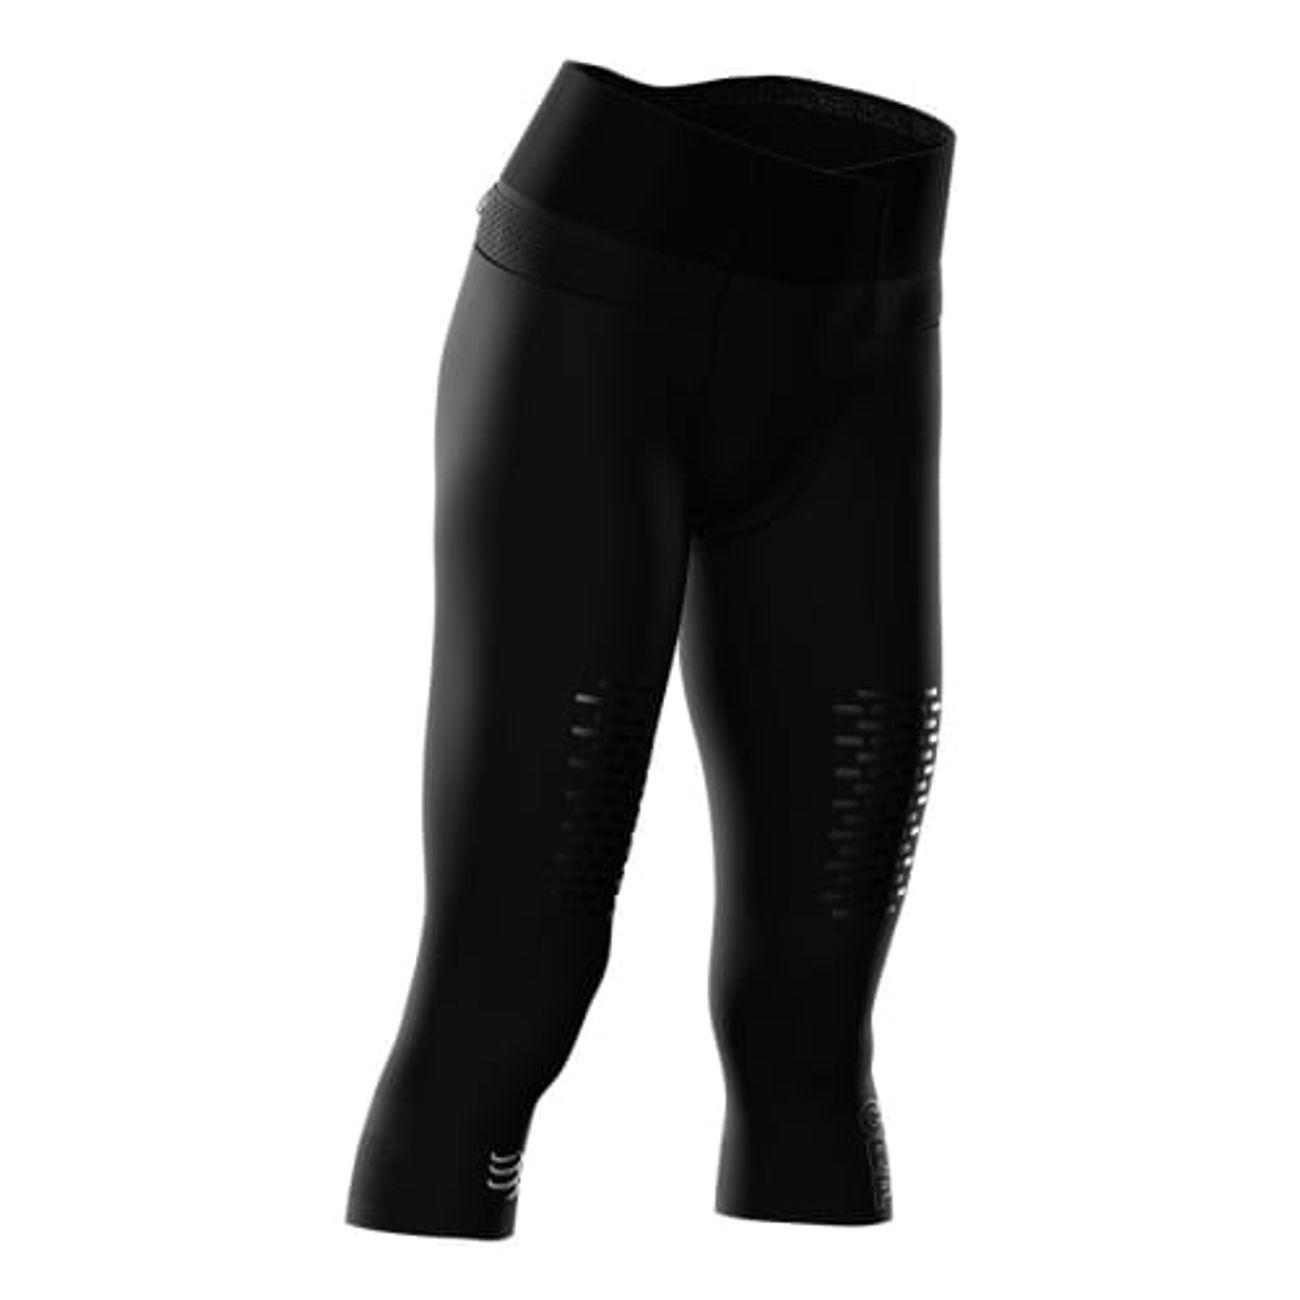 7cd3b68156 legging-corsaire-compressport-trailrunning-under-control-pirate-34-noir-femme_1_v25.jpeg